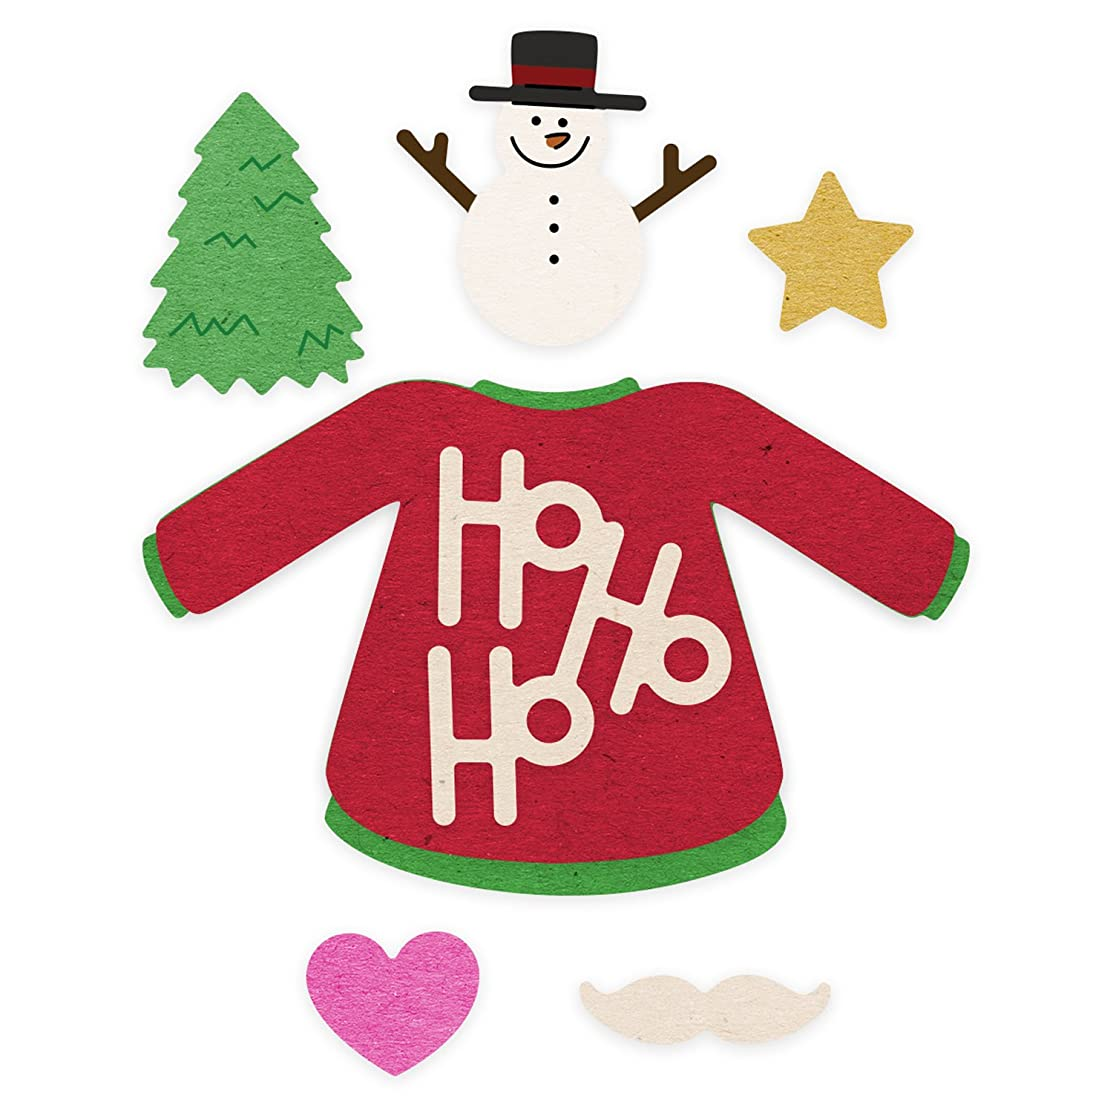 Cheery Lynn Designs Fun with Sweaters Kit Scrapbooking Die Cut Set, 8 Piece